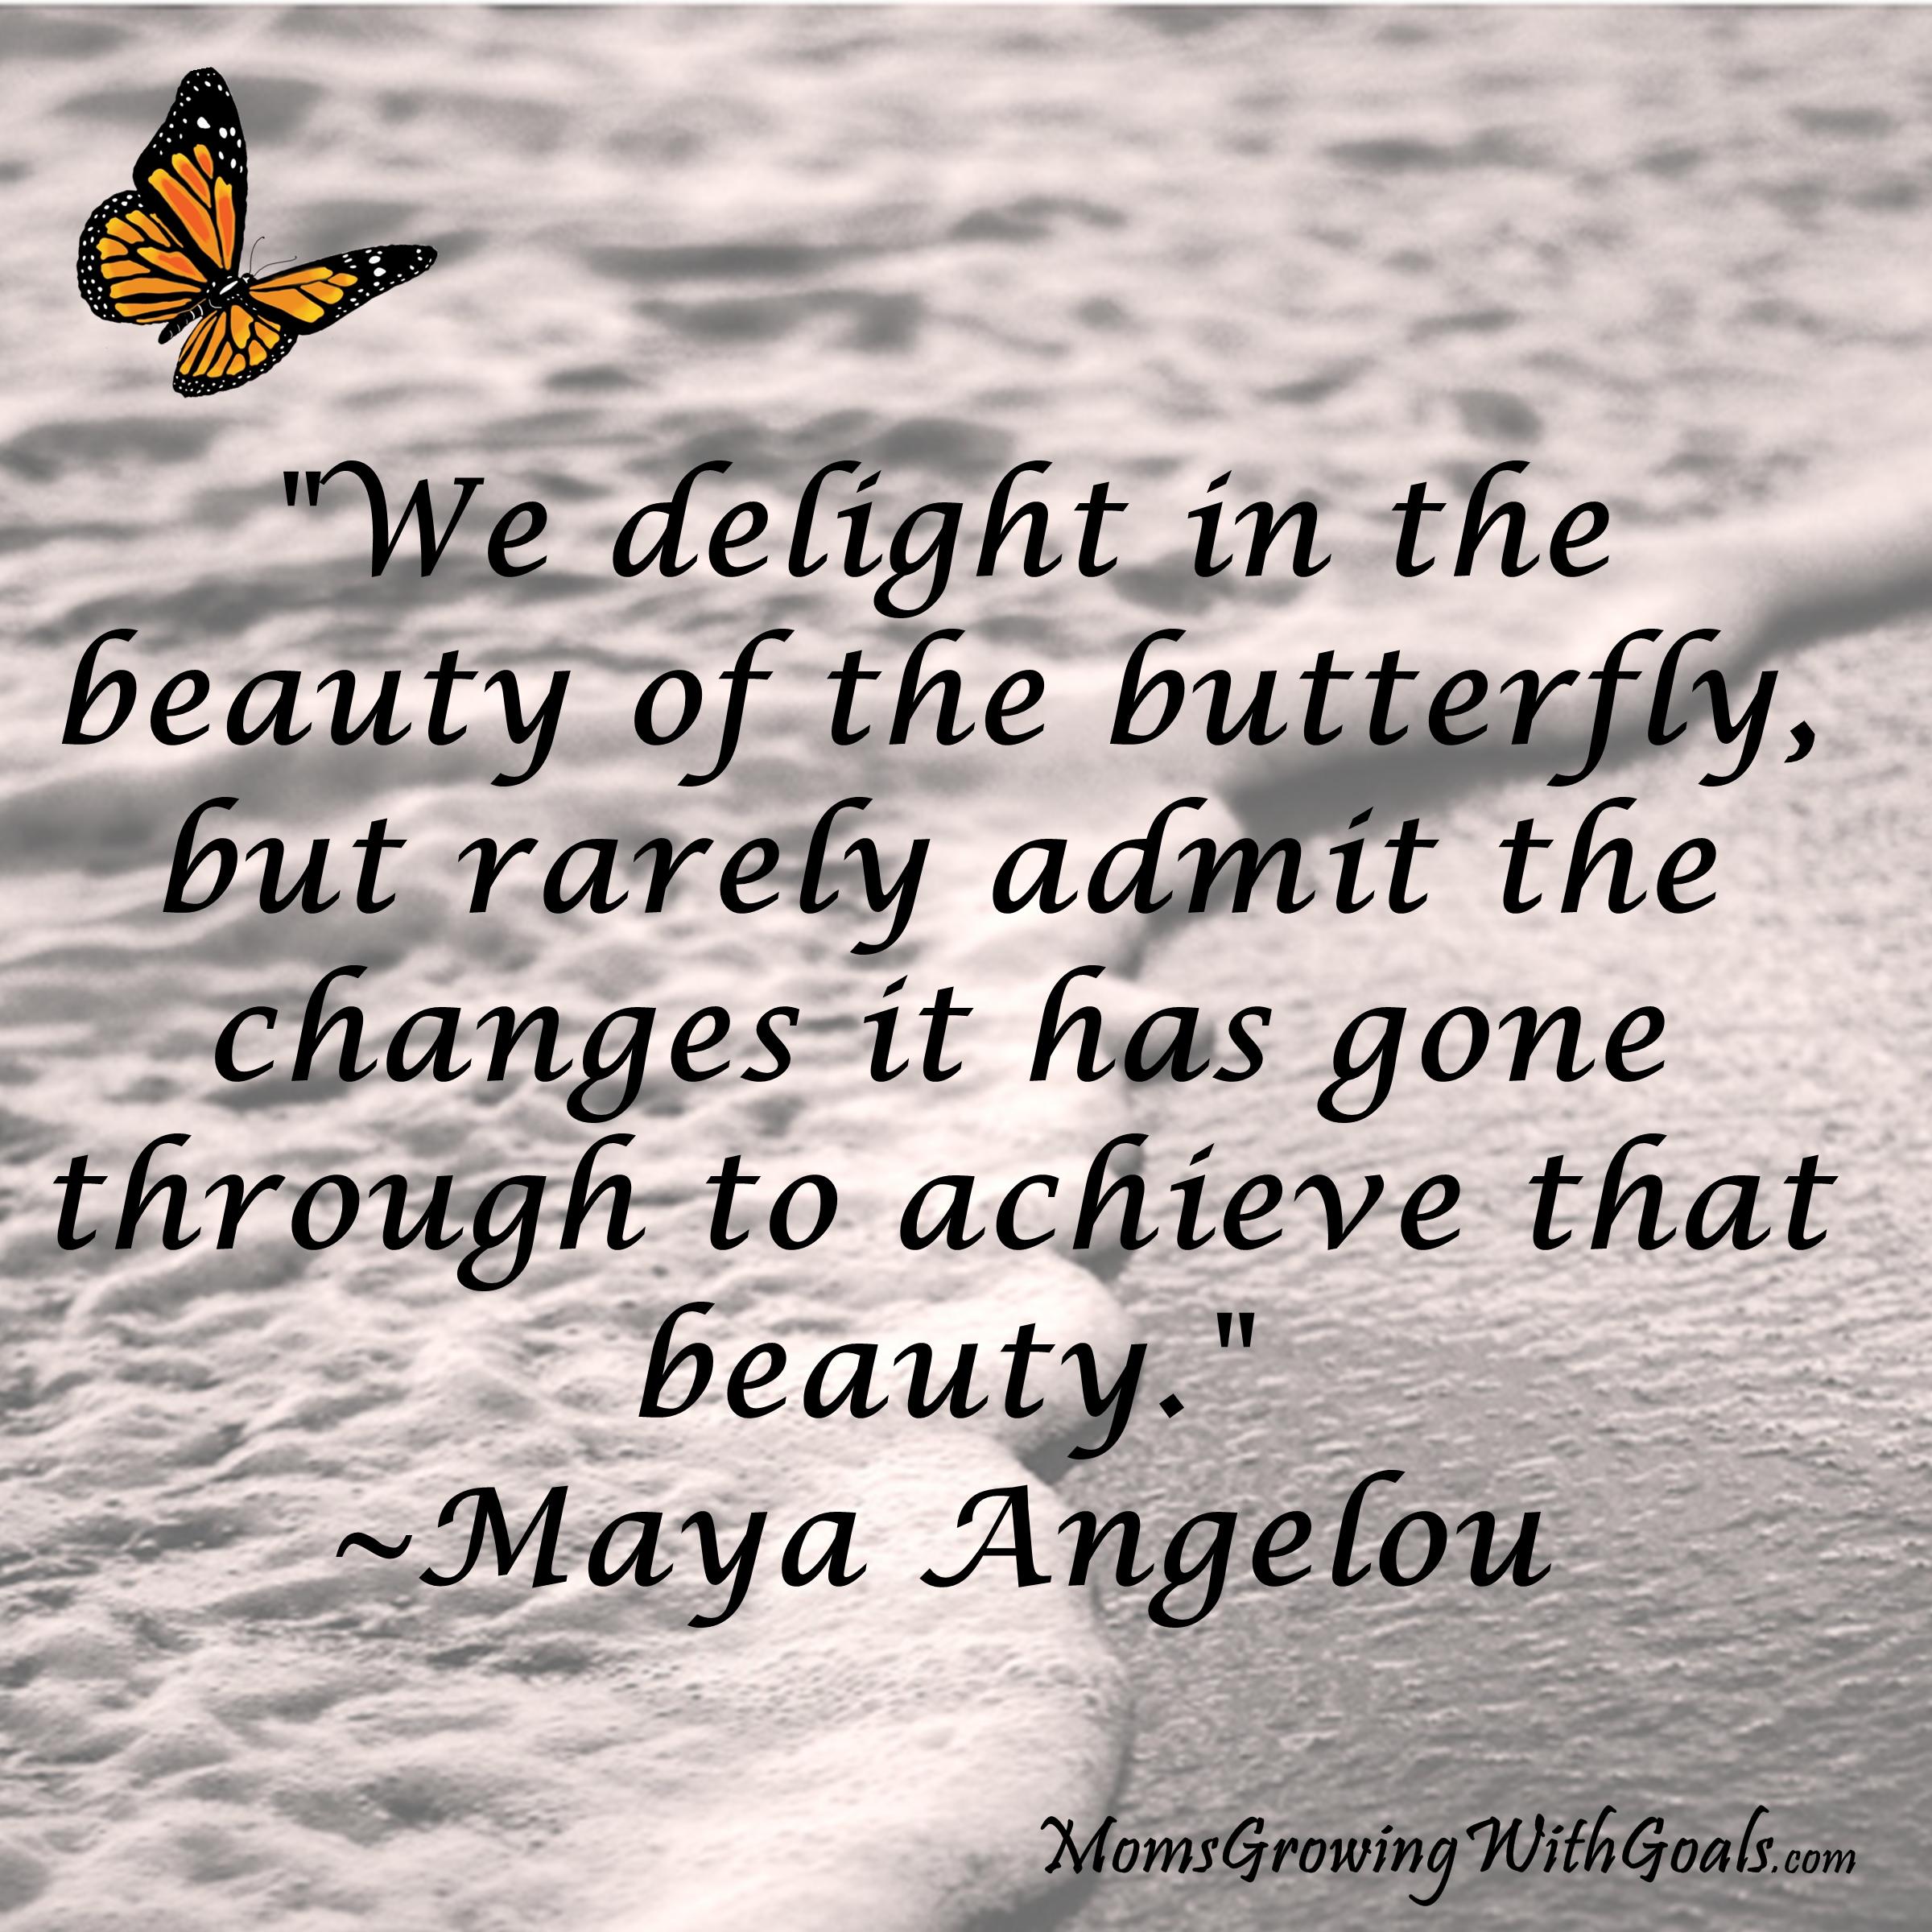 Copyright Free Inspirational Quotes Quotesgram: Inspirational Quotes About Transformation. QuotesGram